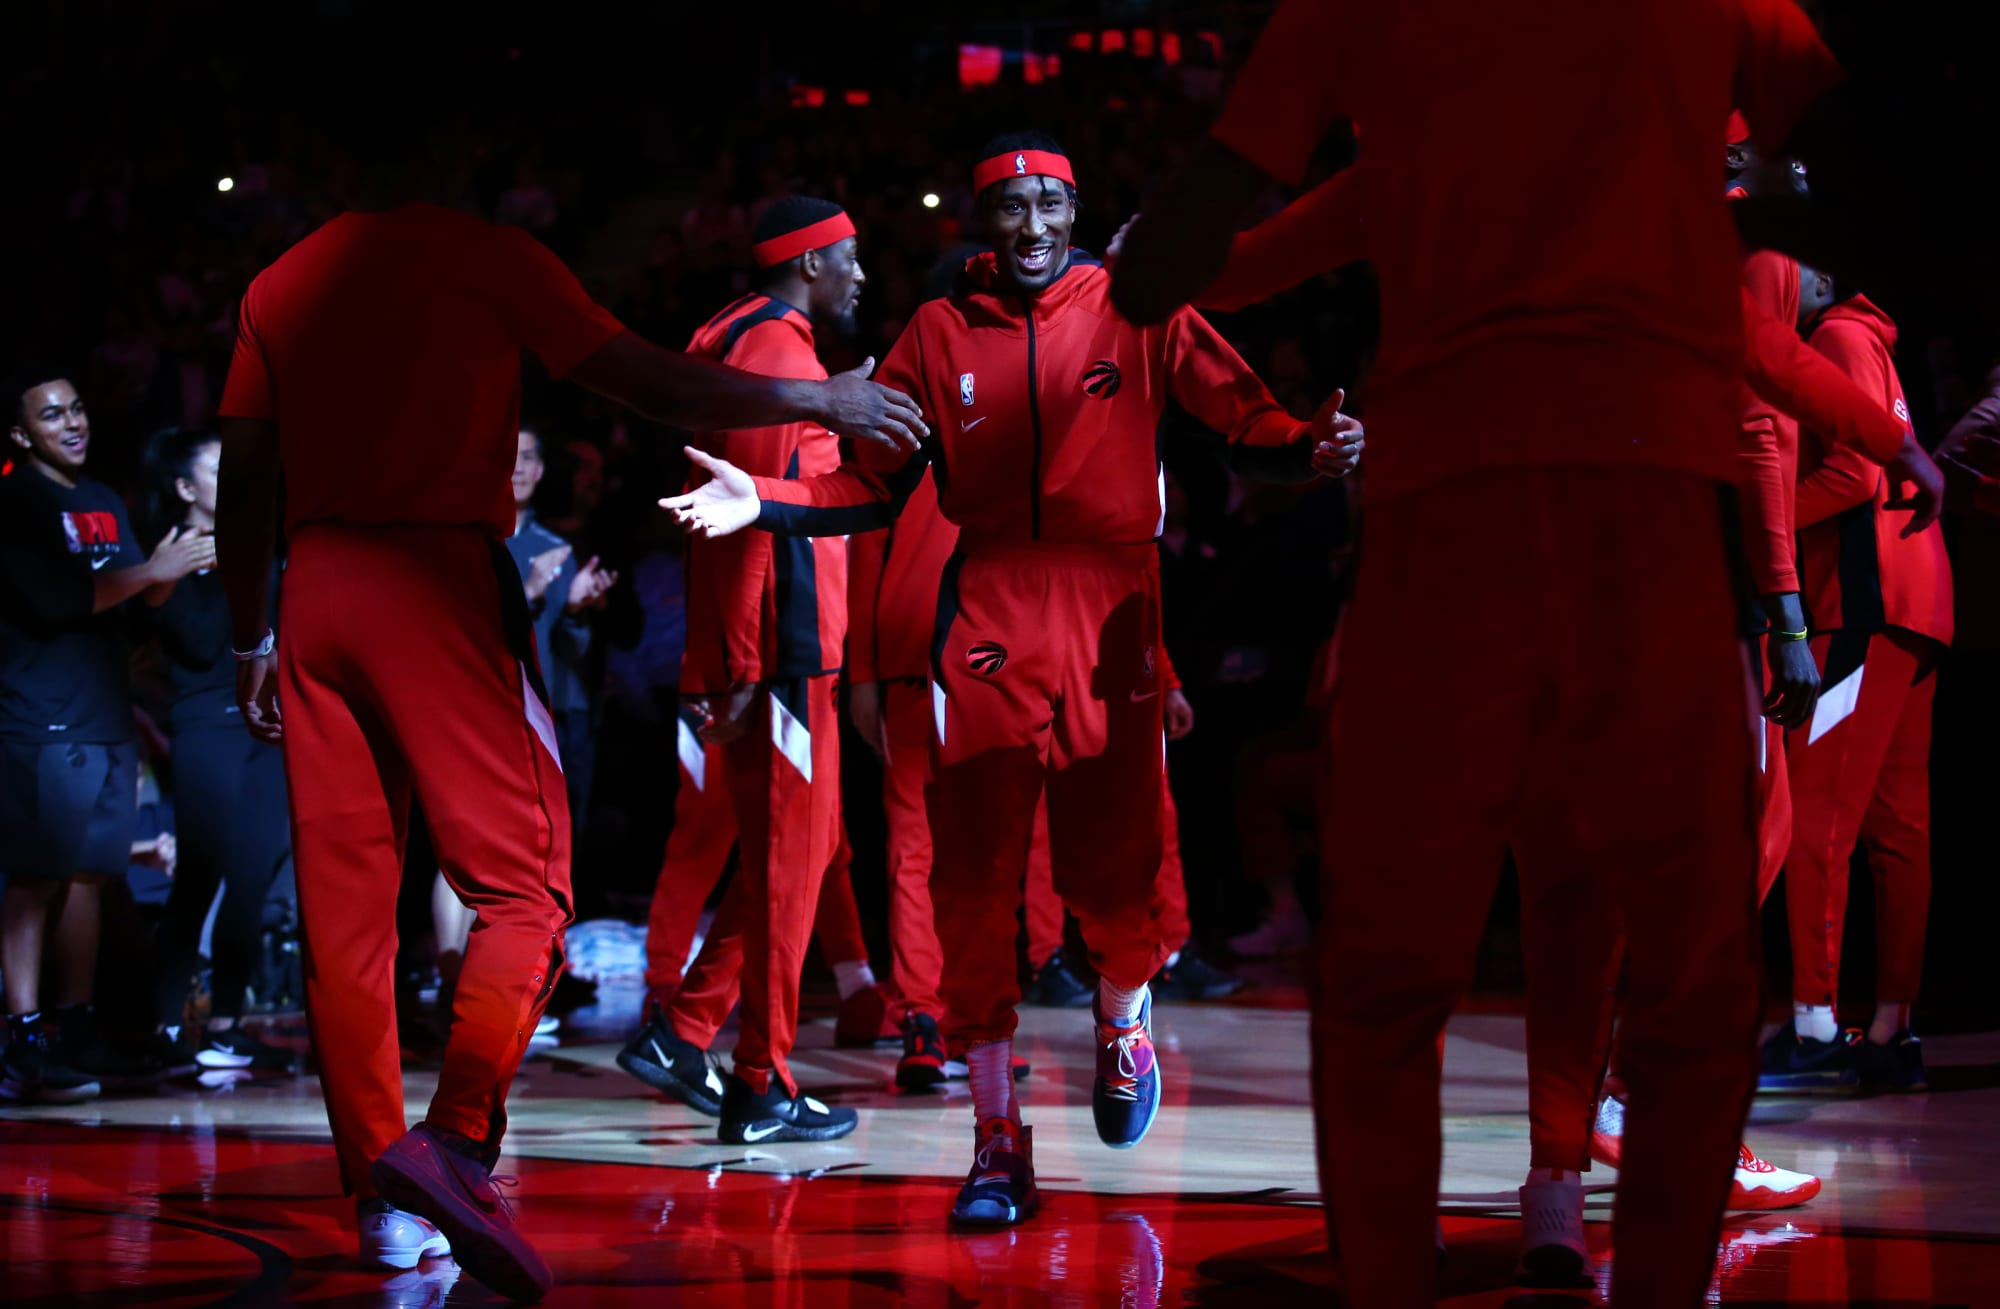 Hey Toronto Raptors, bring back our boy Rondae Hollis-Jefferson